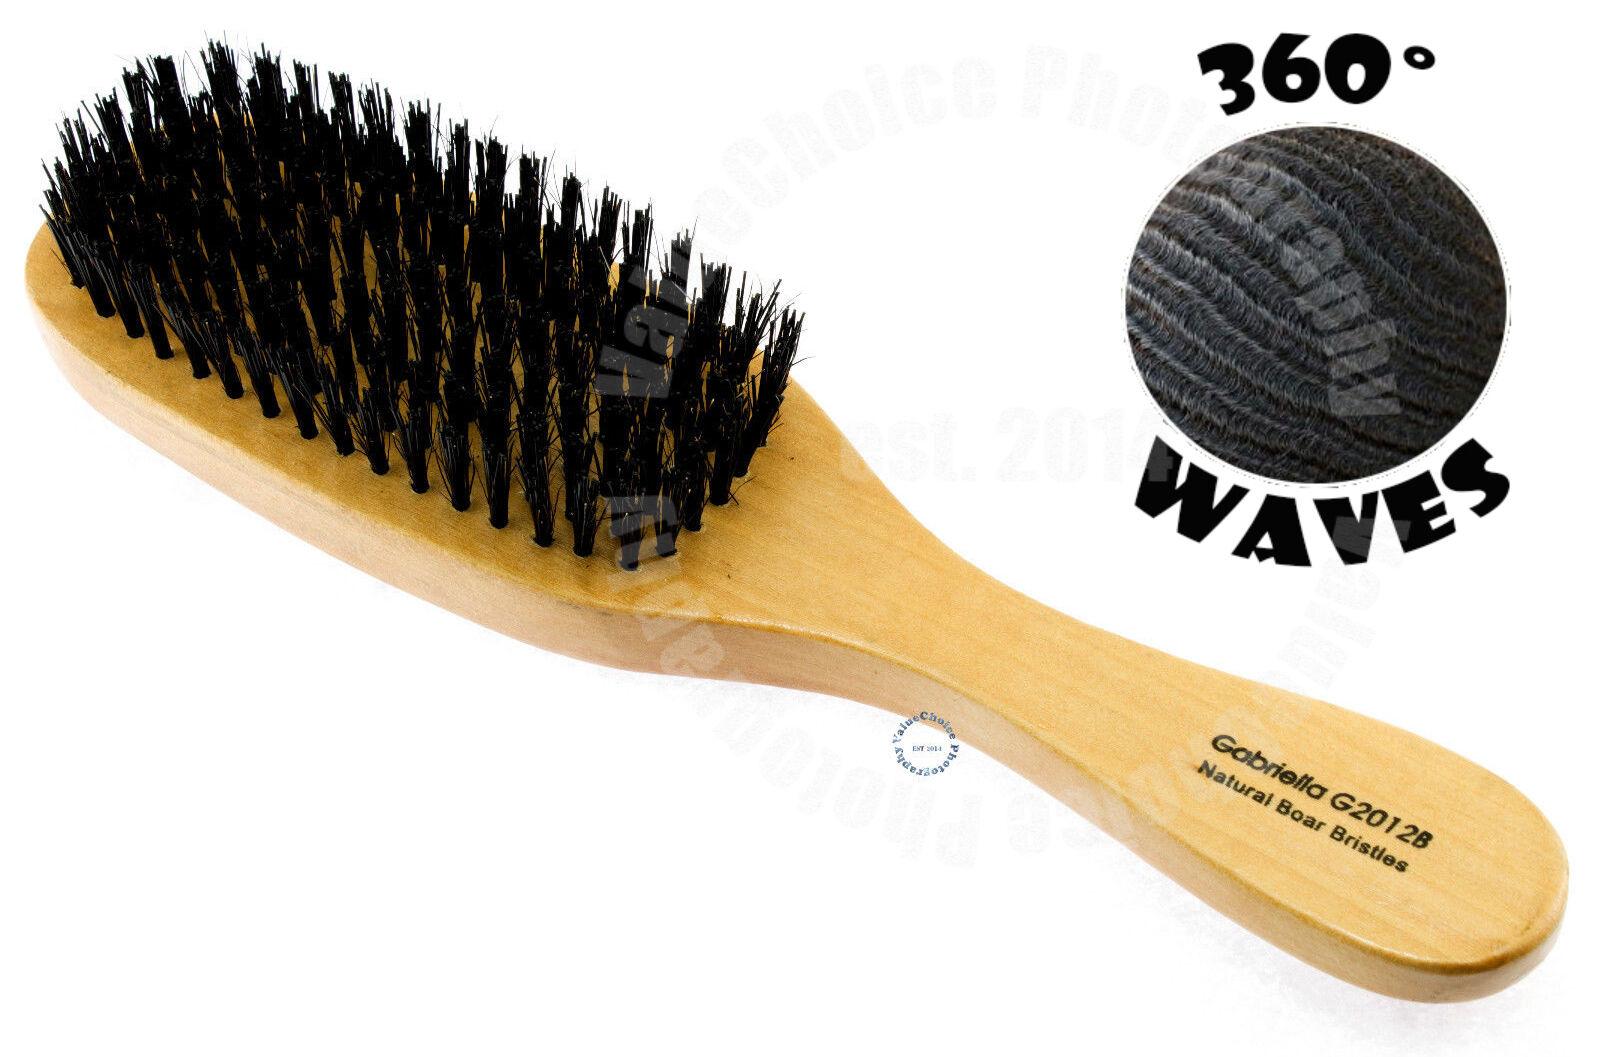 WAVE HAIR BRUSH WOOD HANDLE REINFORCED HARD BRISTLE MEN PROF